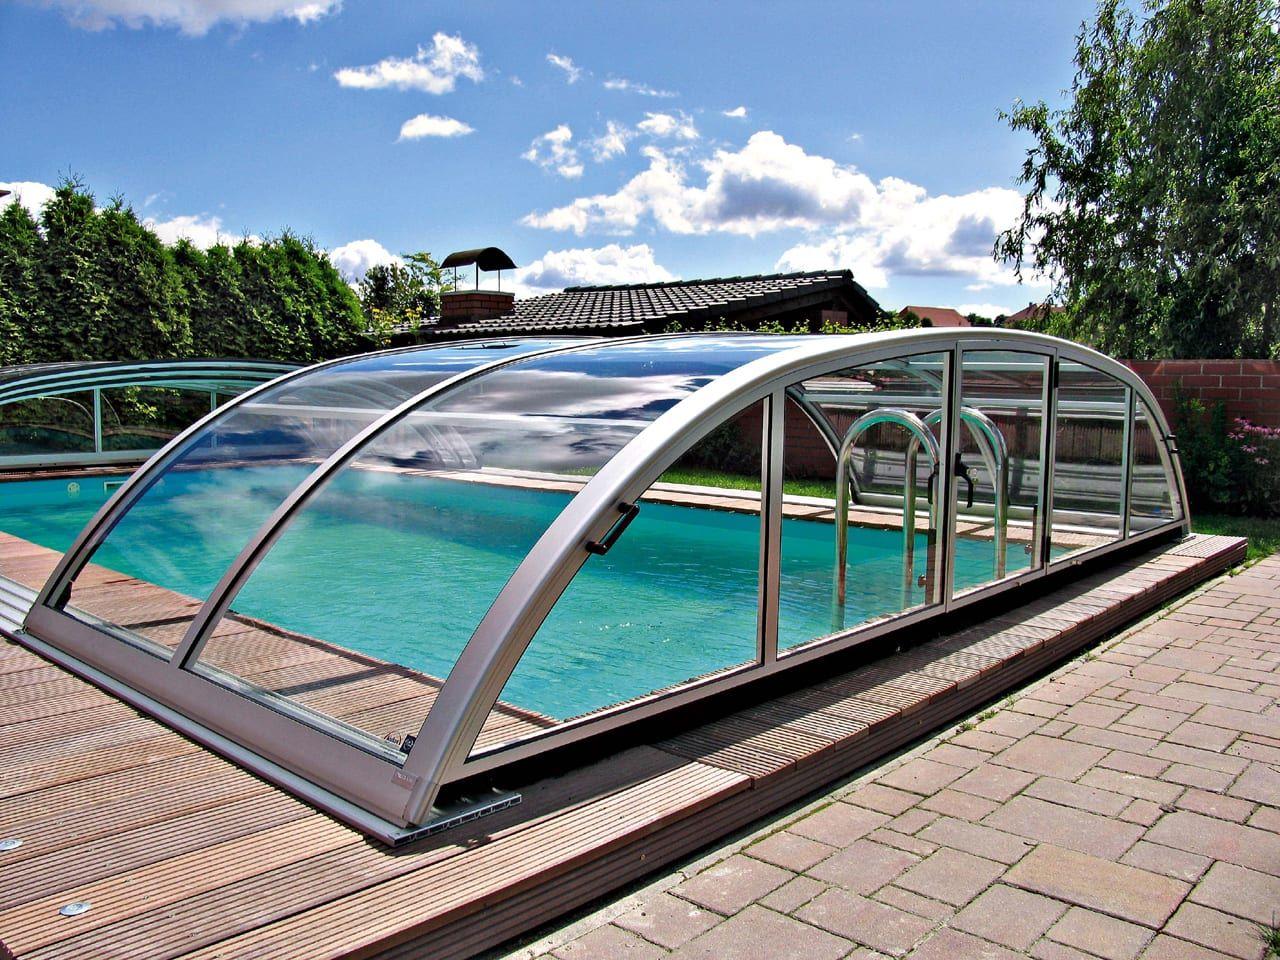 Elegant lowlevel modular pool enclosure in ground pool